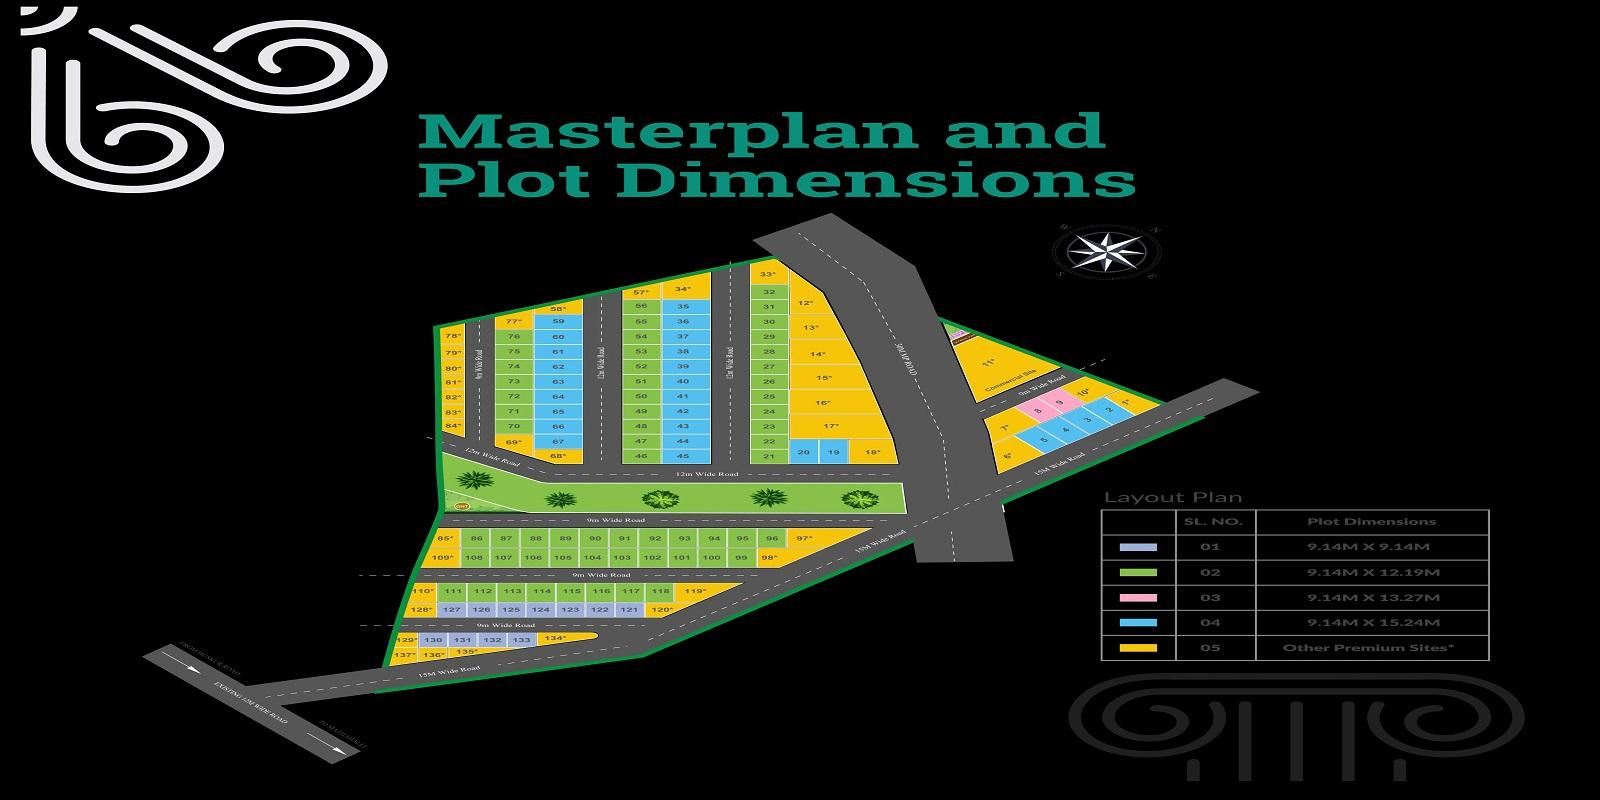 neelanchanl kns athena project master plan image1